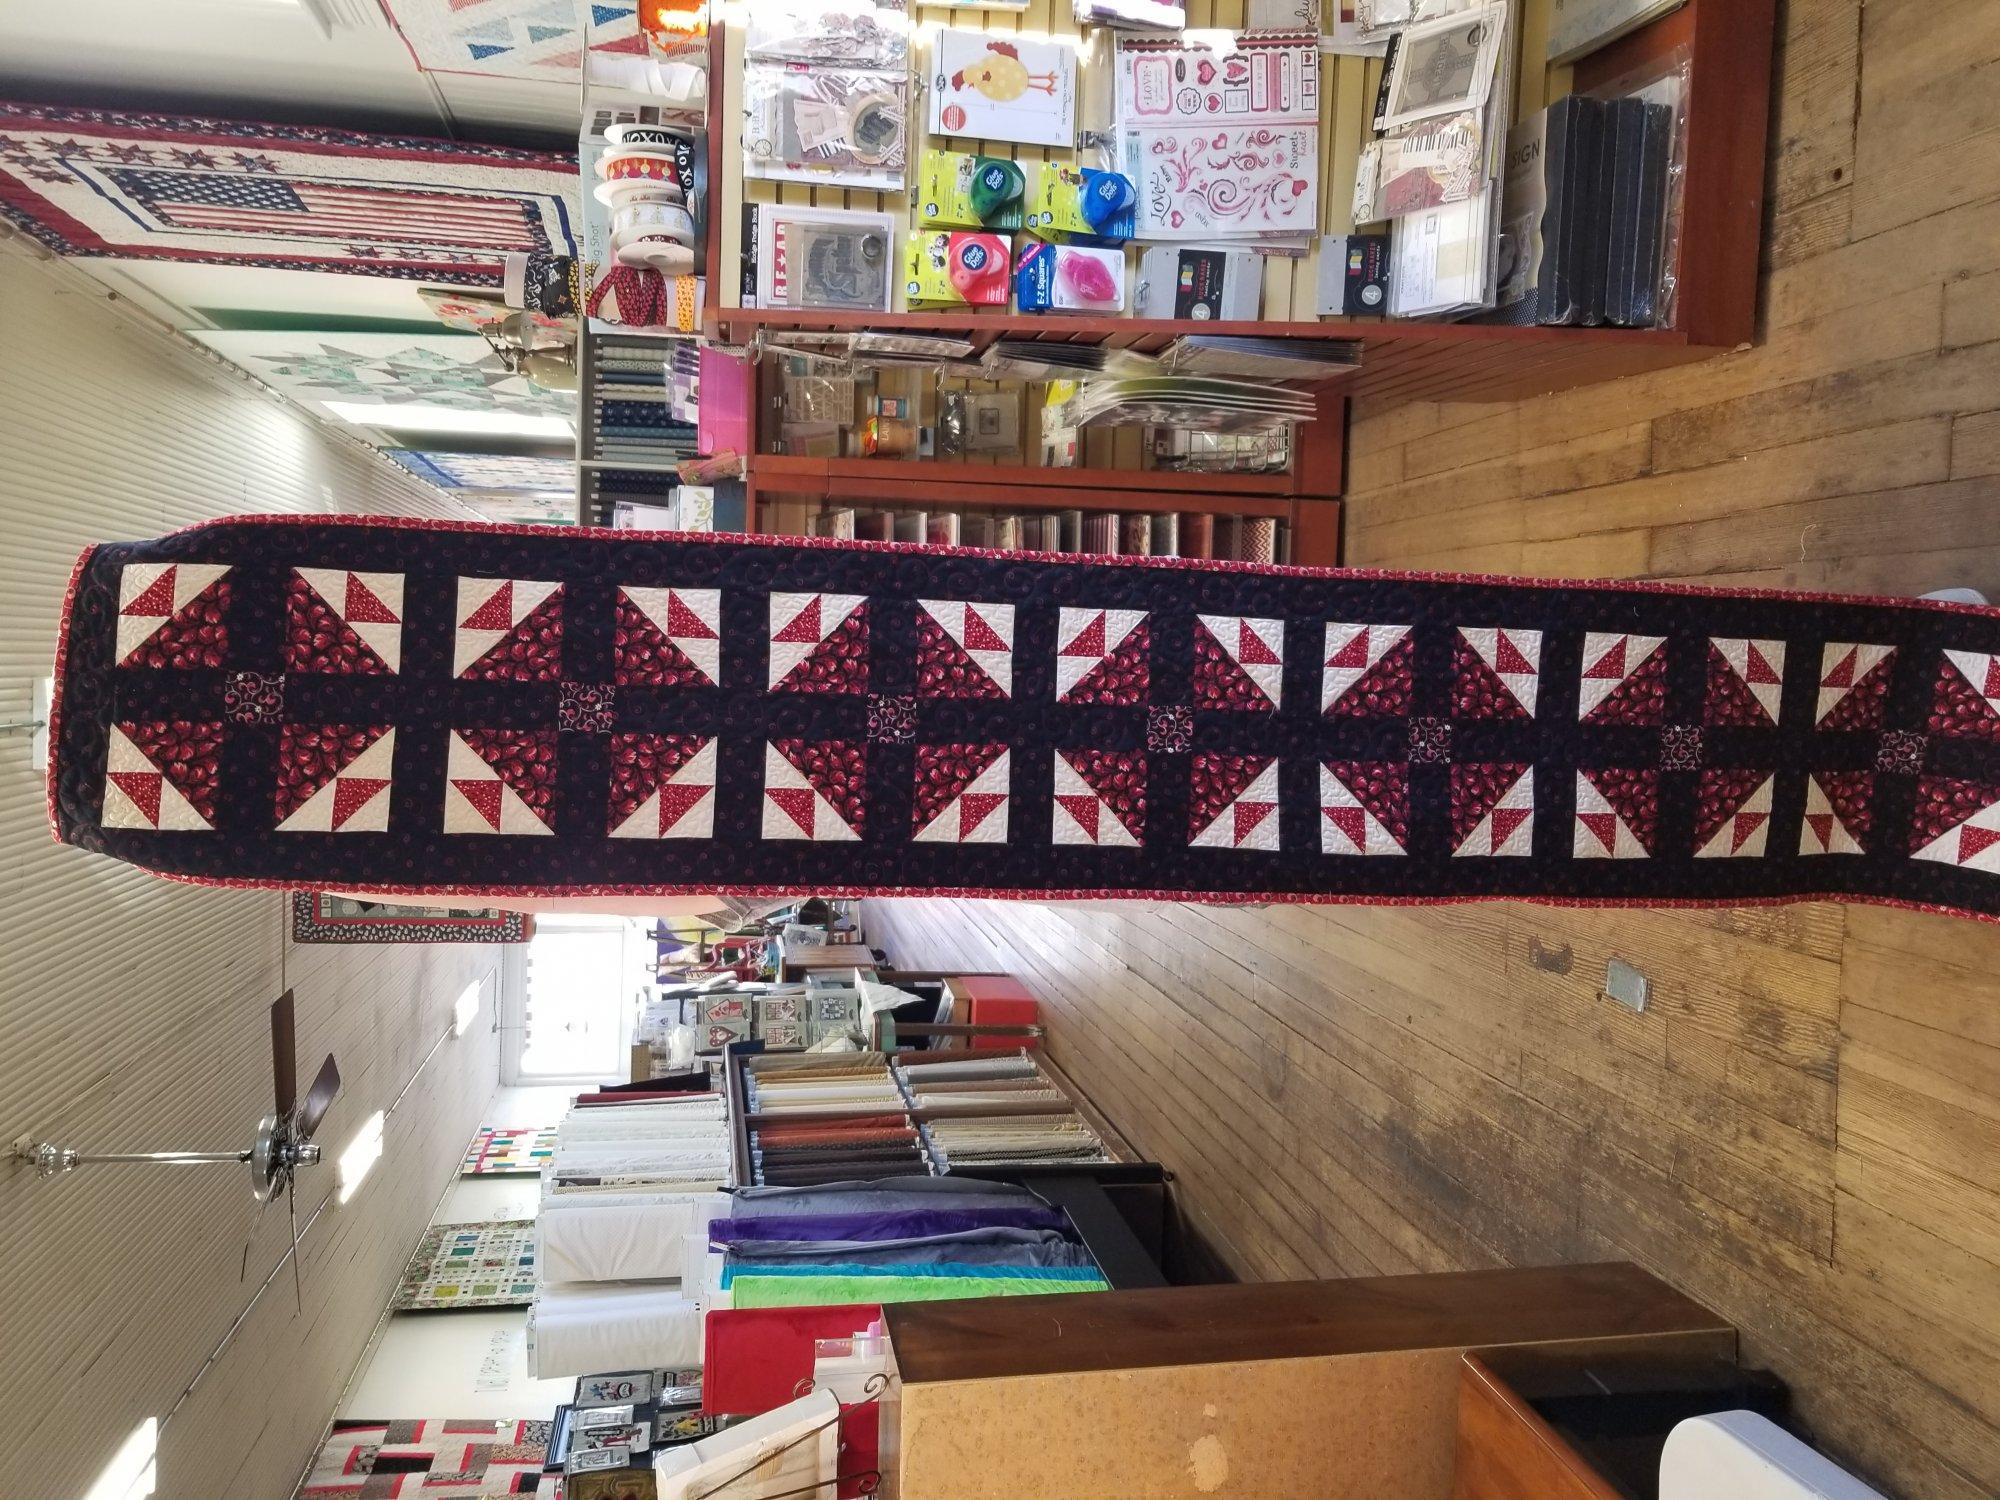 Red and Black Hen & Chicks Long Table Runner Store Sample